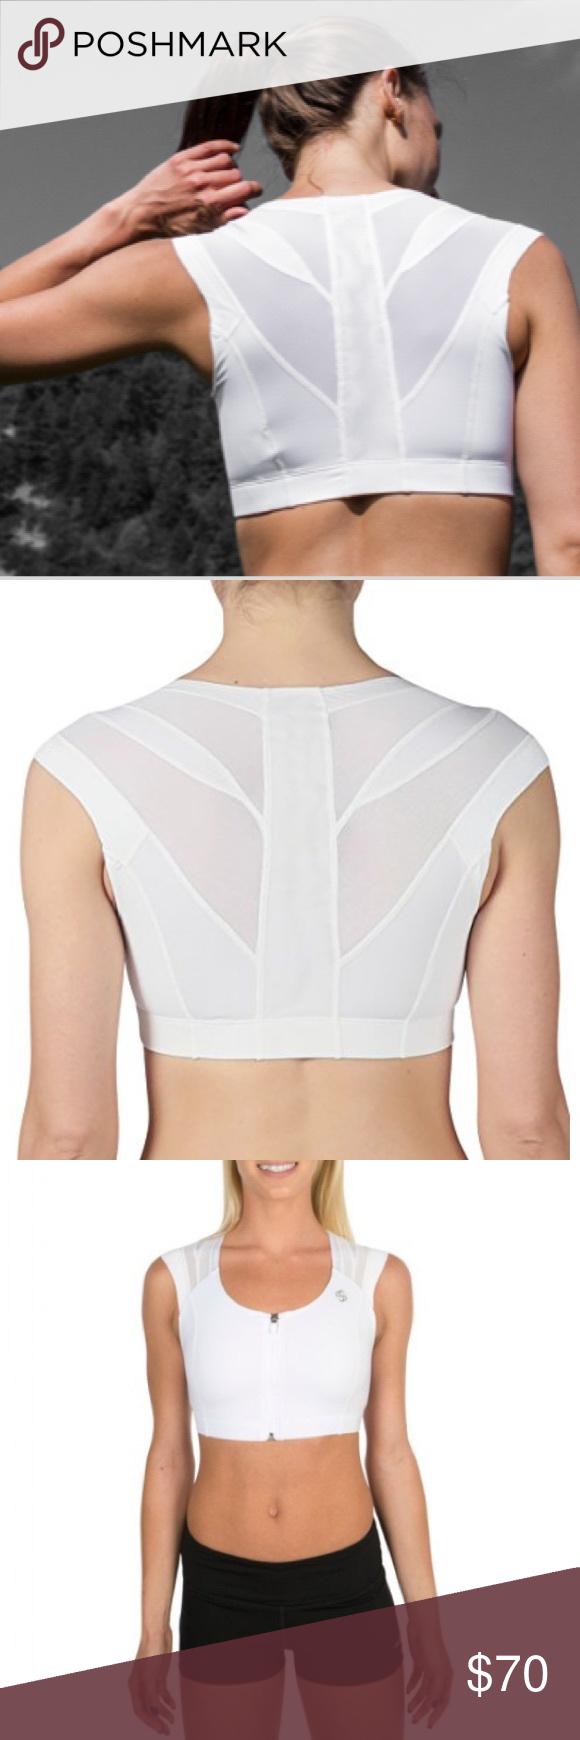 NWT IntelliSkin Posture Correcting sport bra Bought from